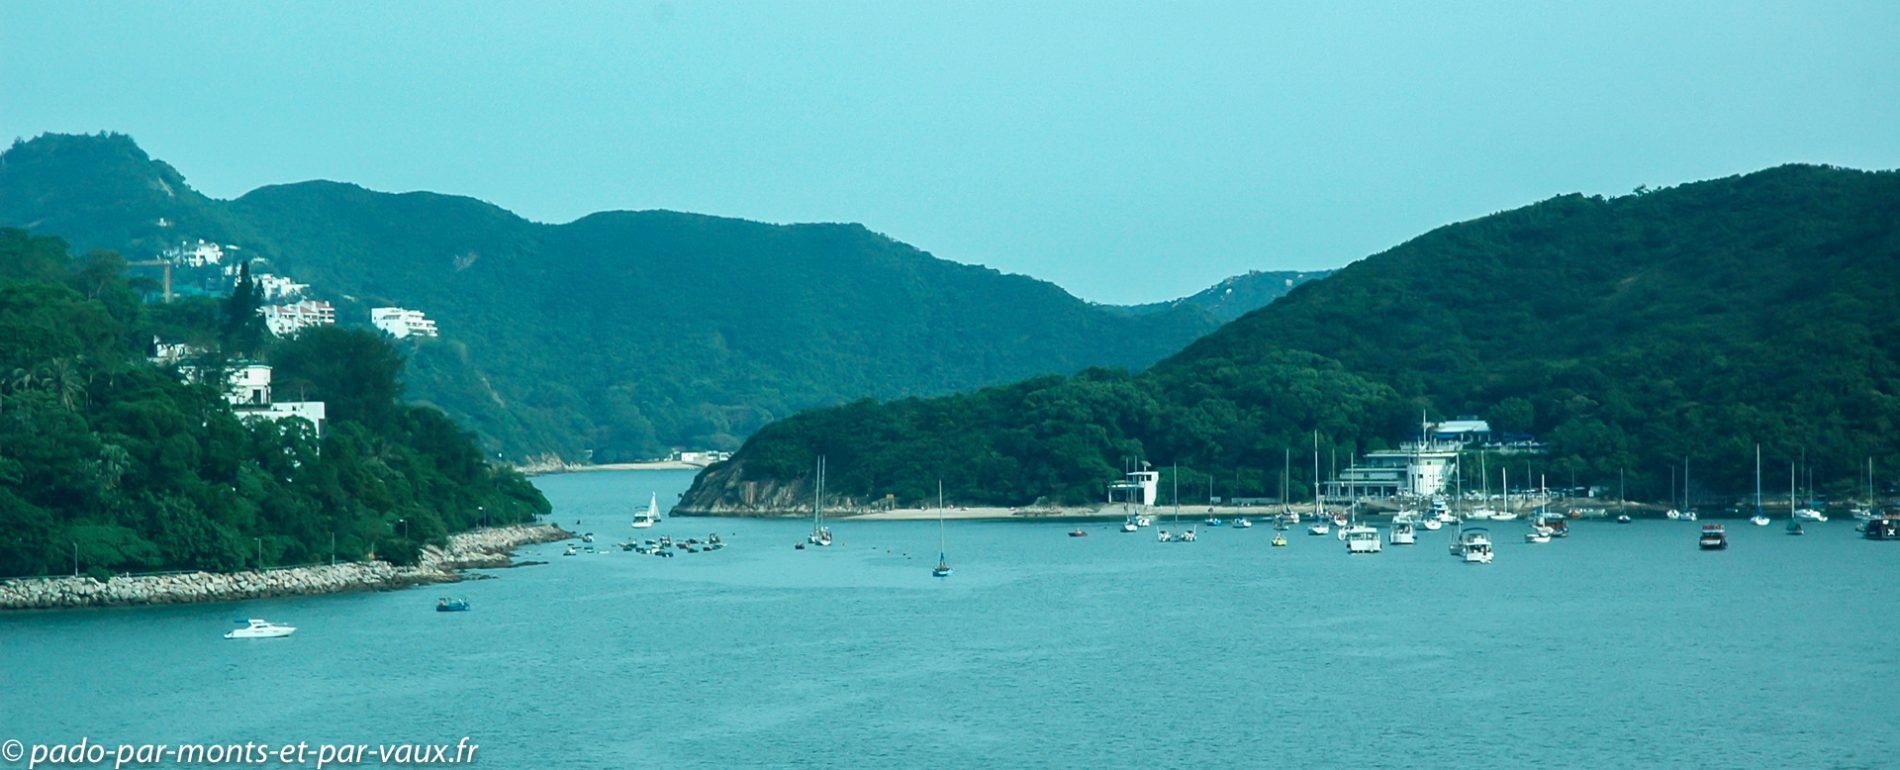 Sud de l'île de Hong Kong